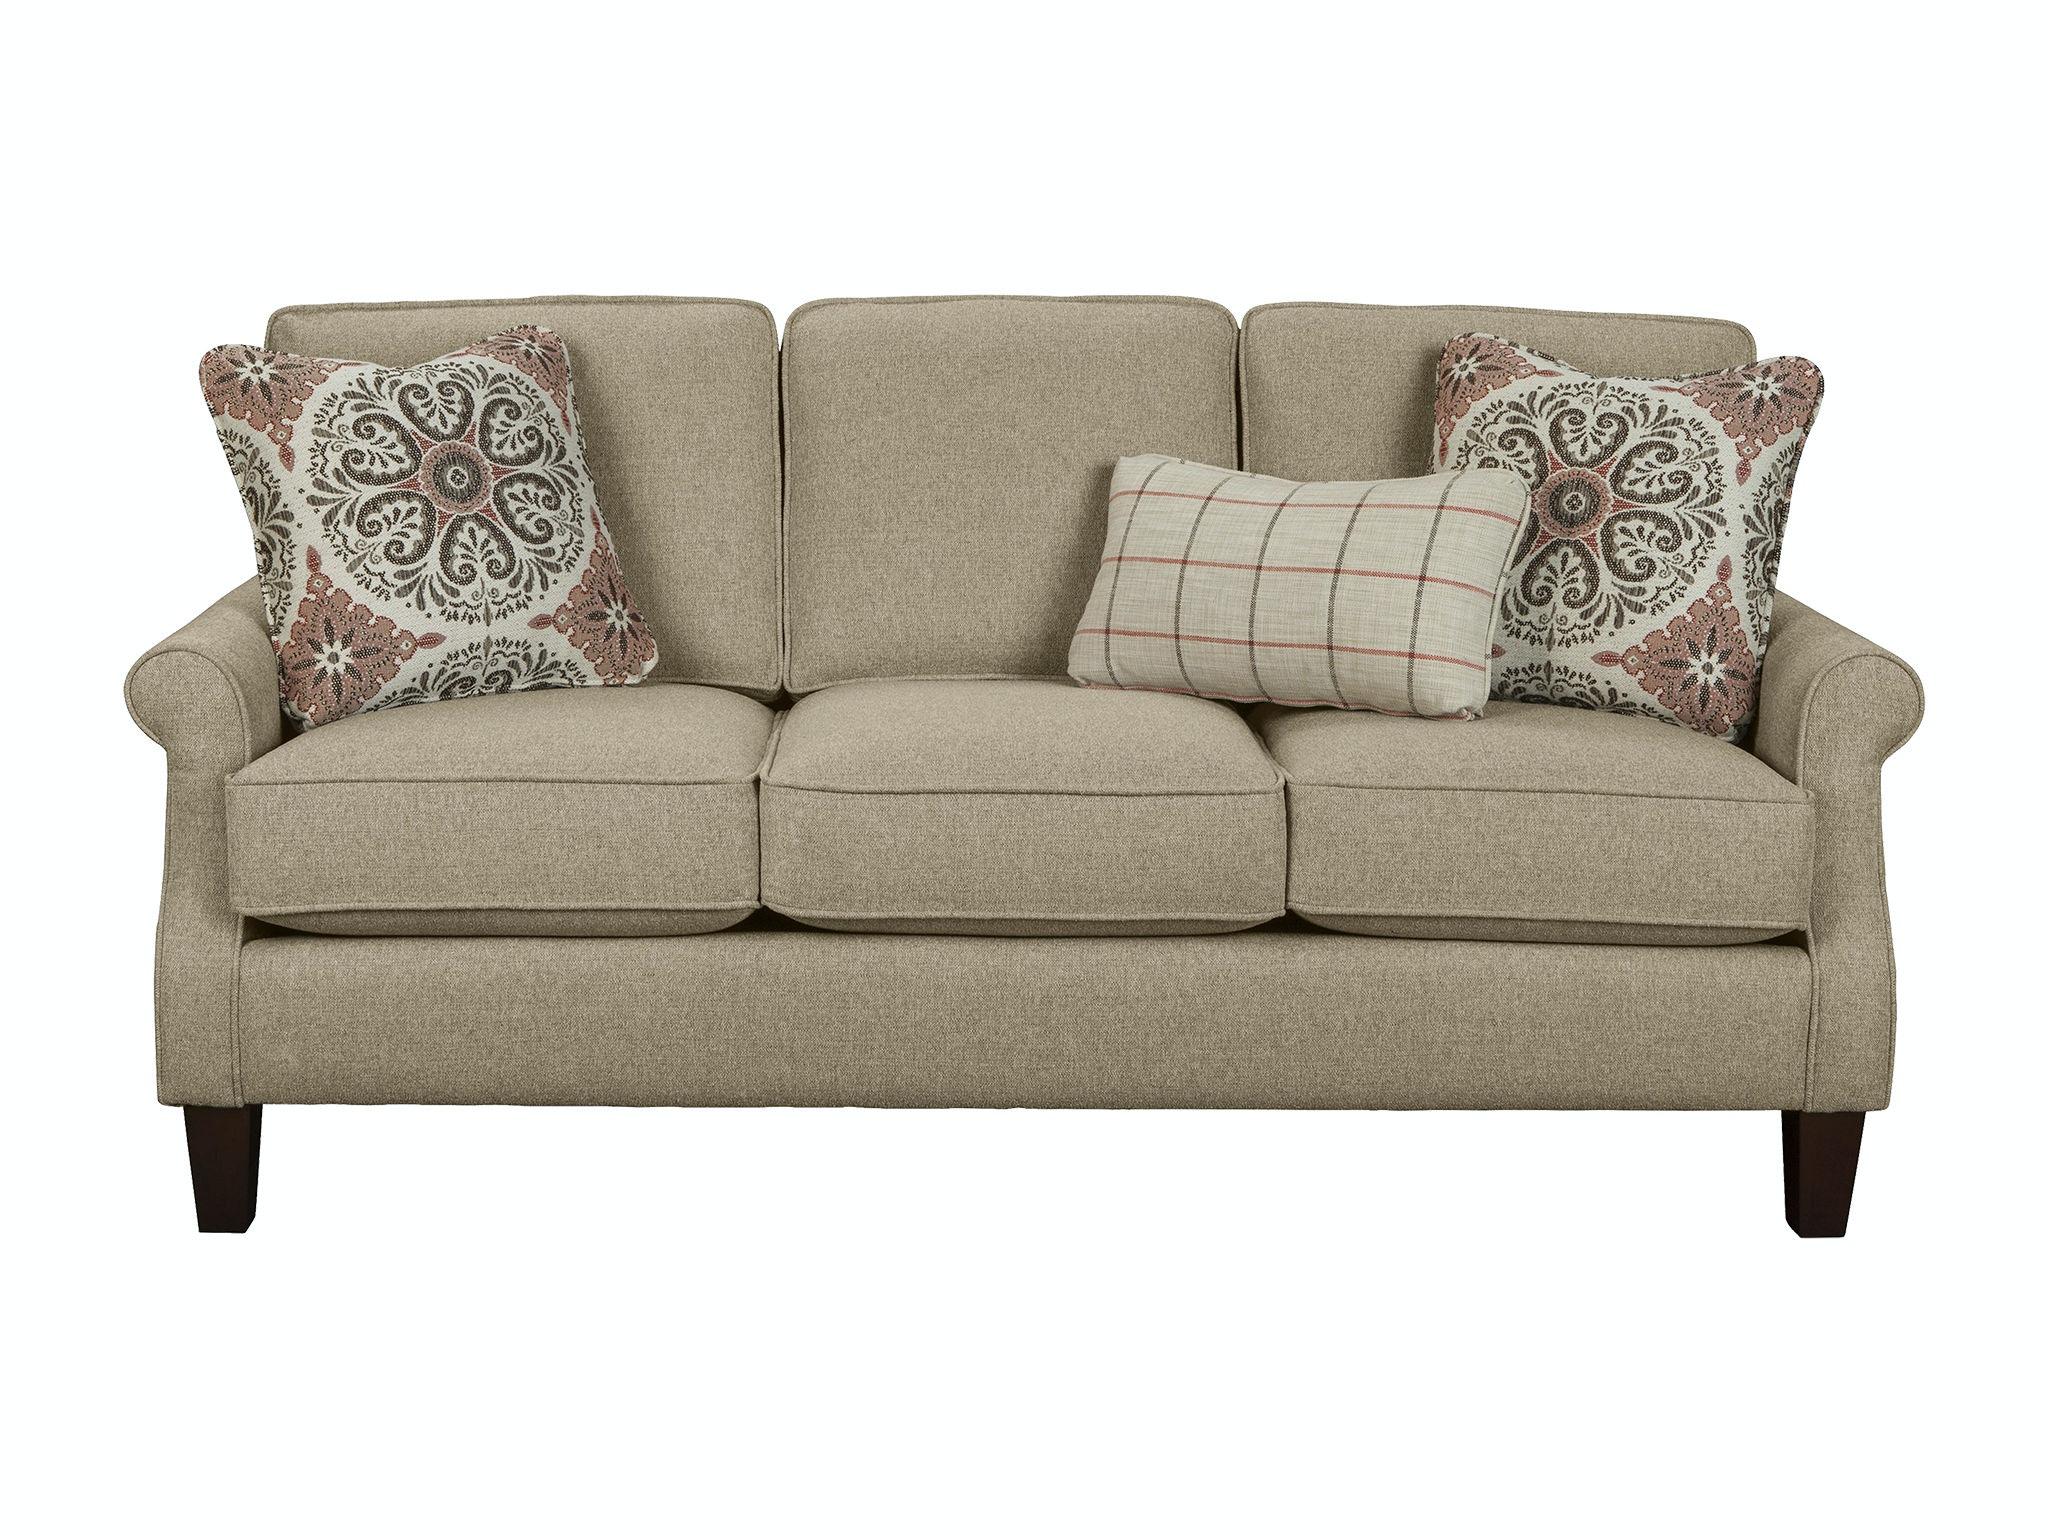 Cozy Life Sofa 771950 ...